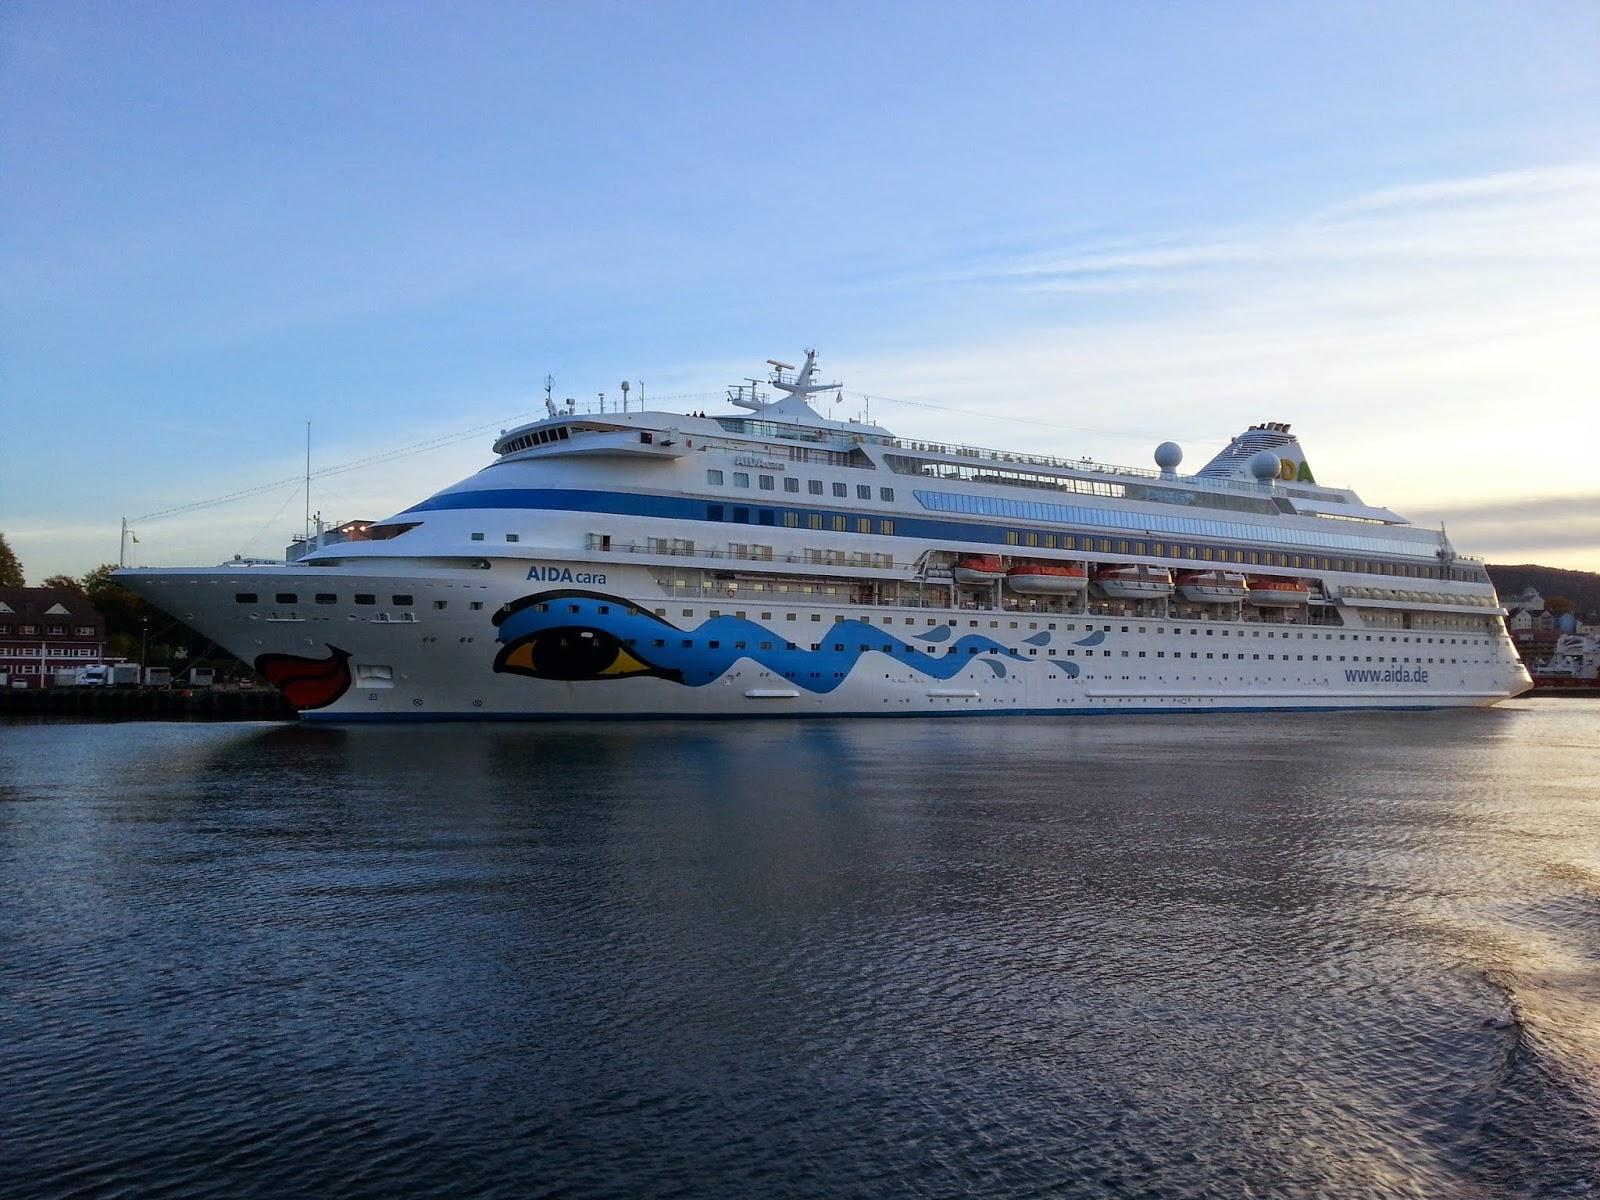 Cruise Ship AIDAcara in Bergen, Norway